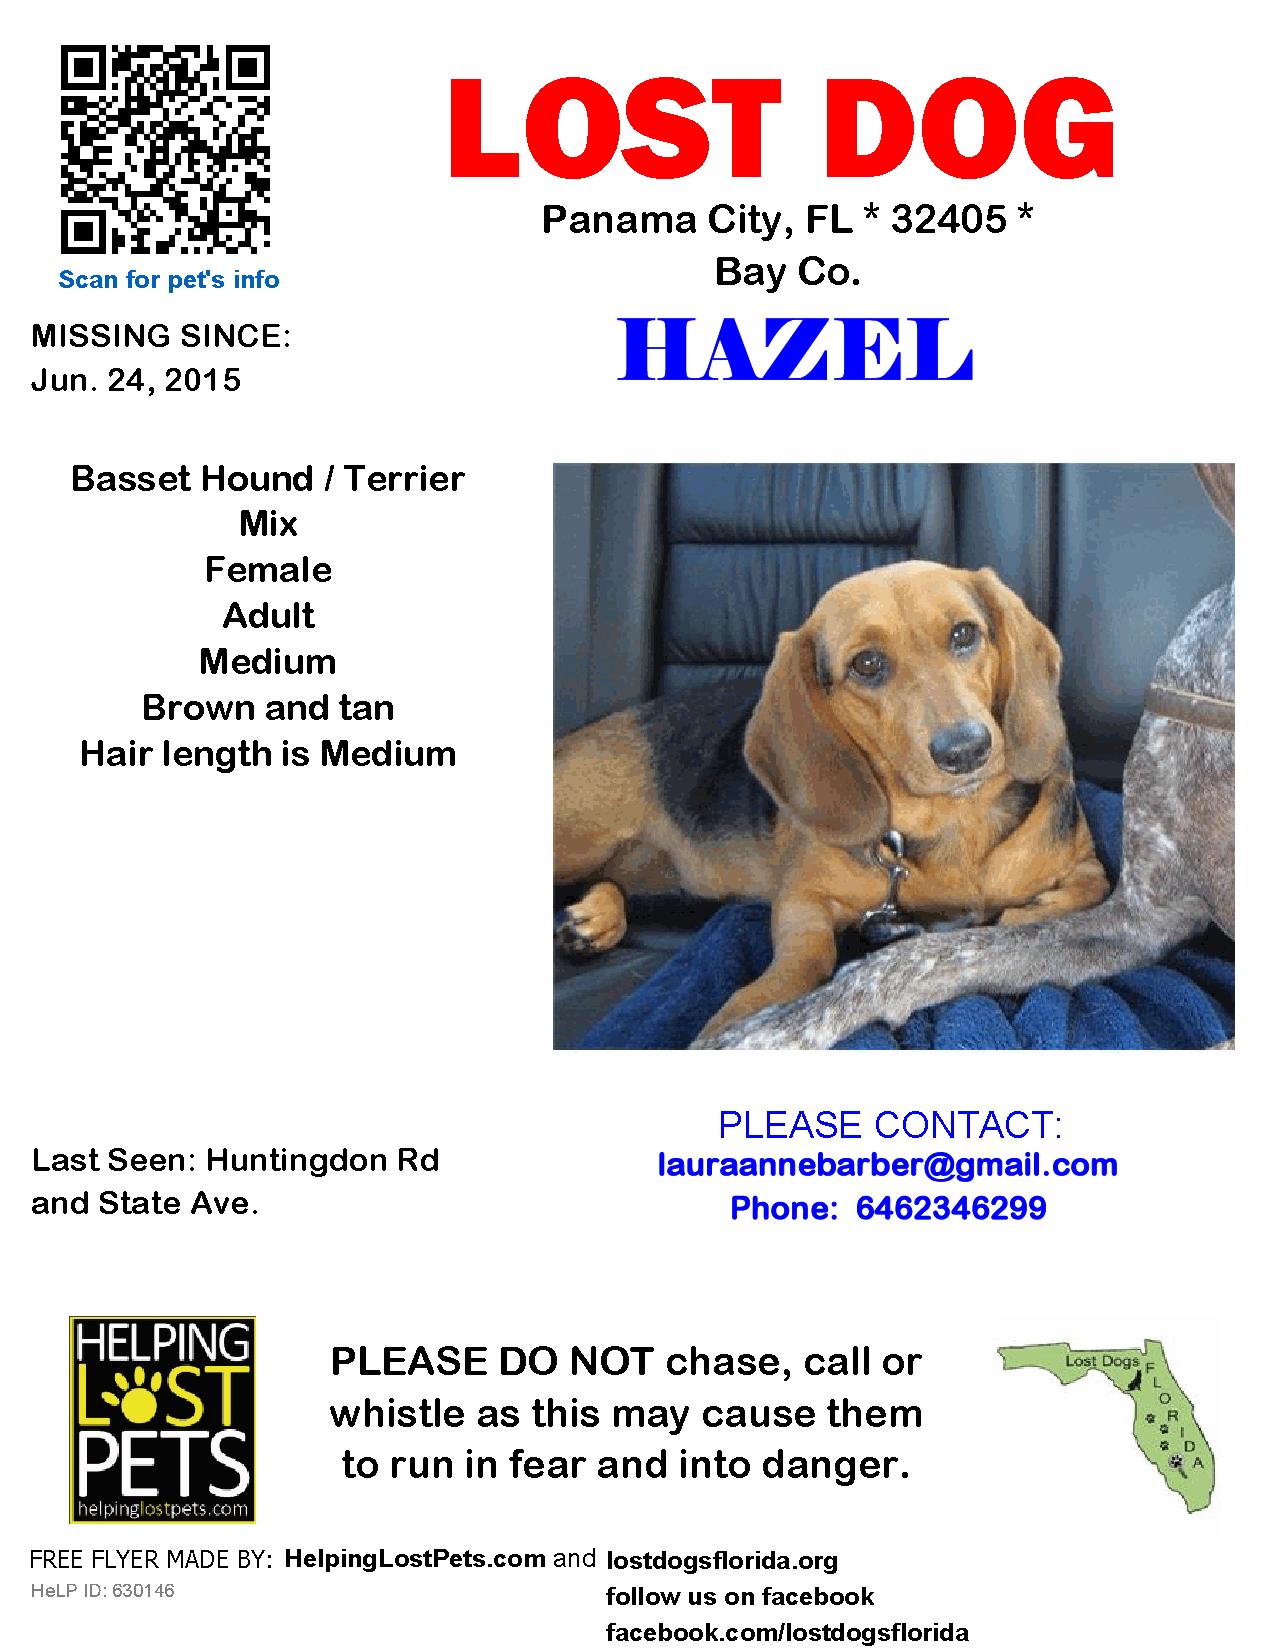 Lost Dog Female Panama City, FL, USA 32405 Losing a